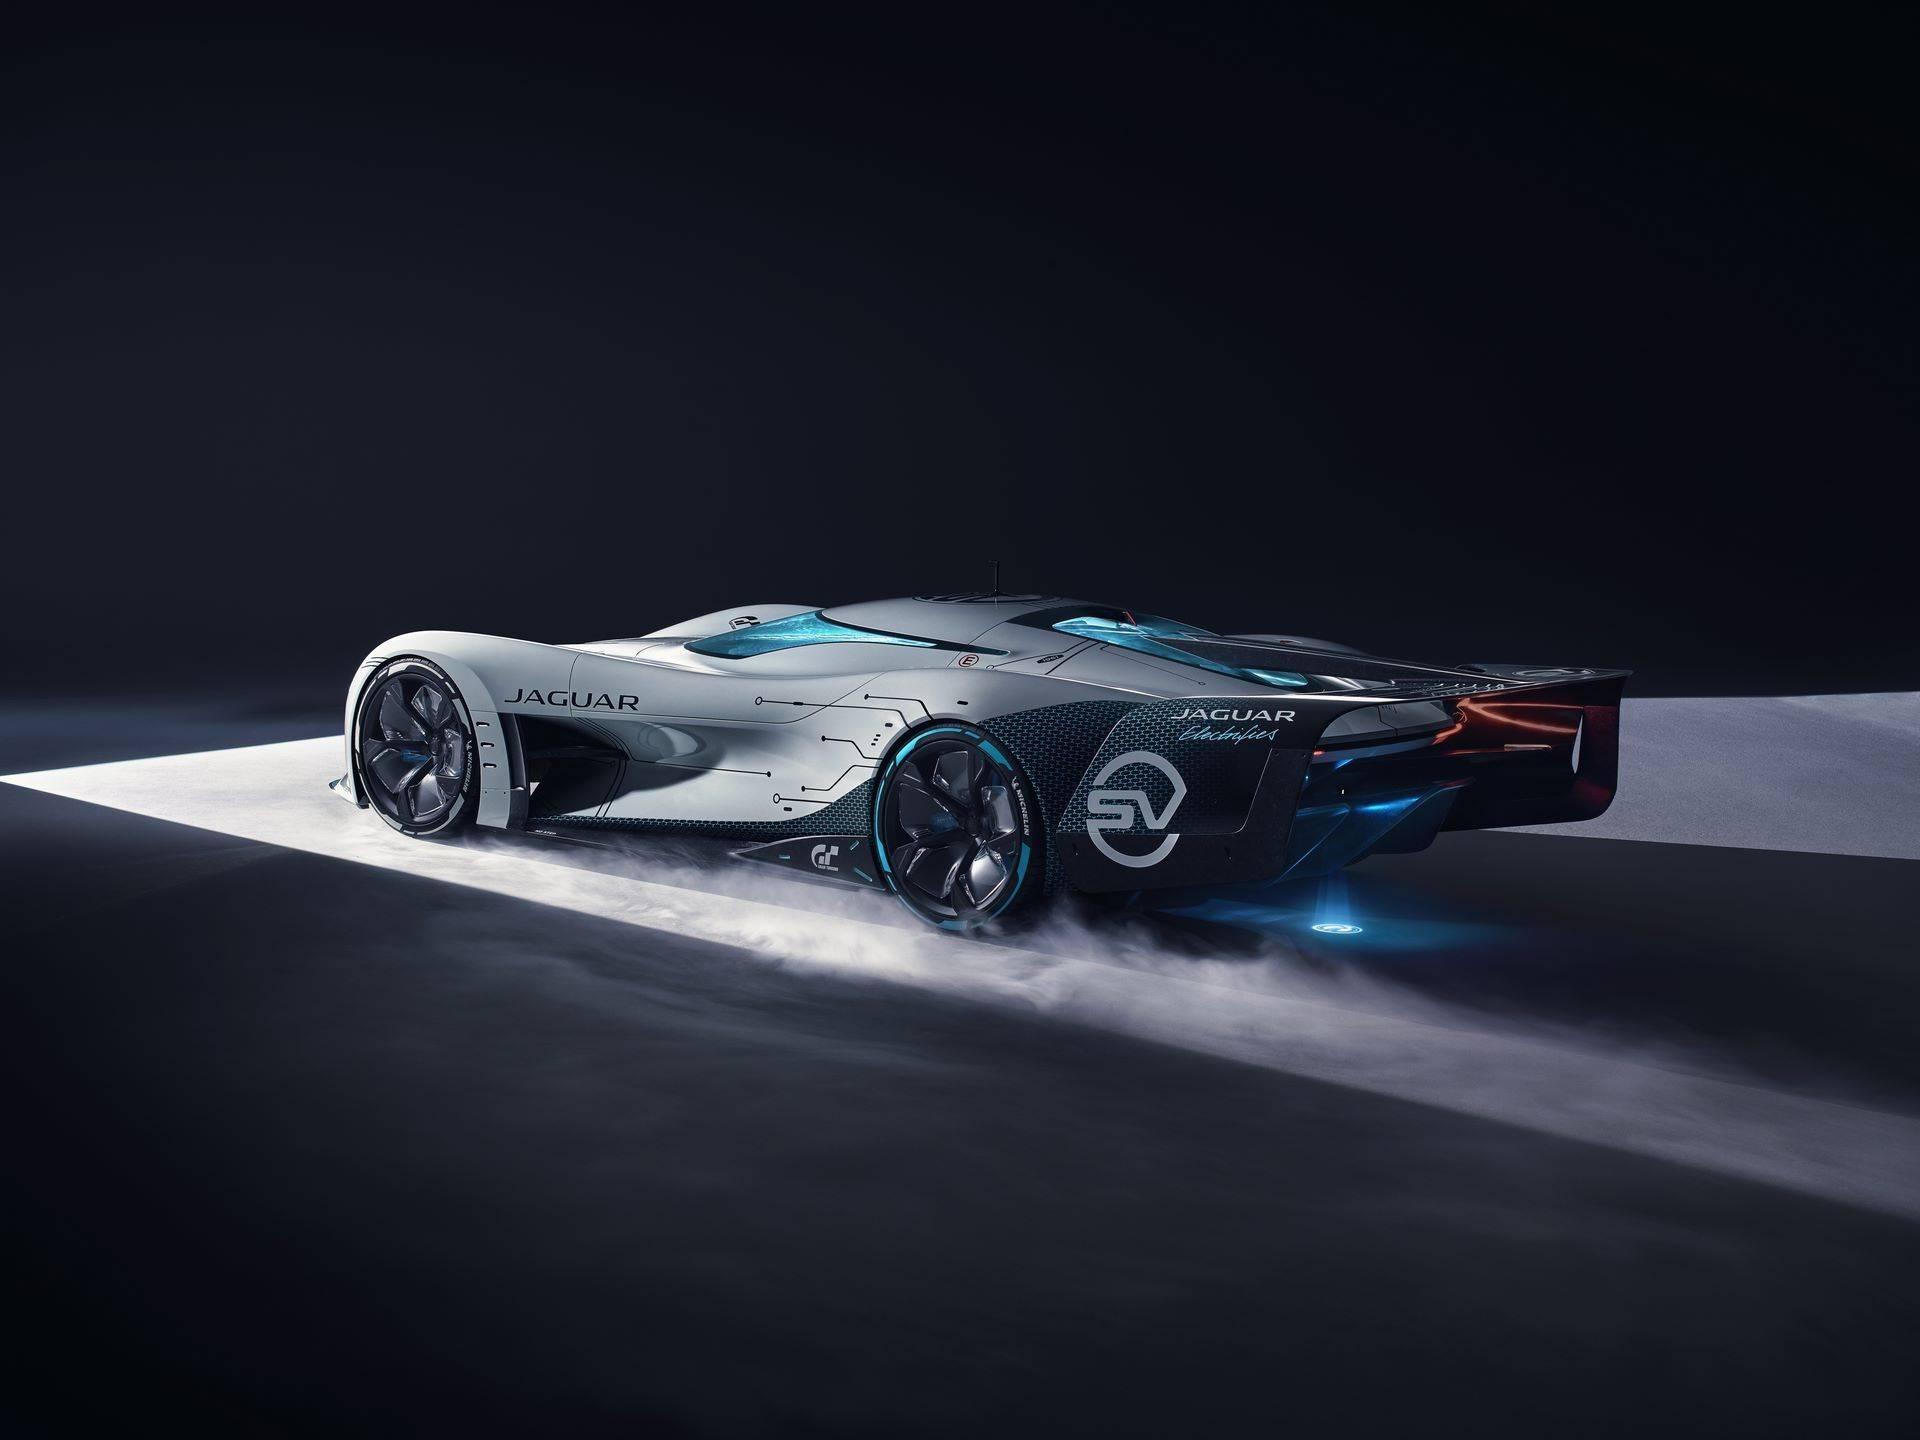 Jaguar-Vision-Gran-Turismo-SV-41